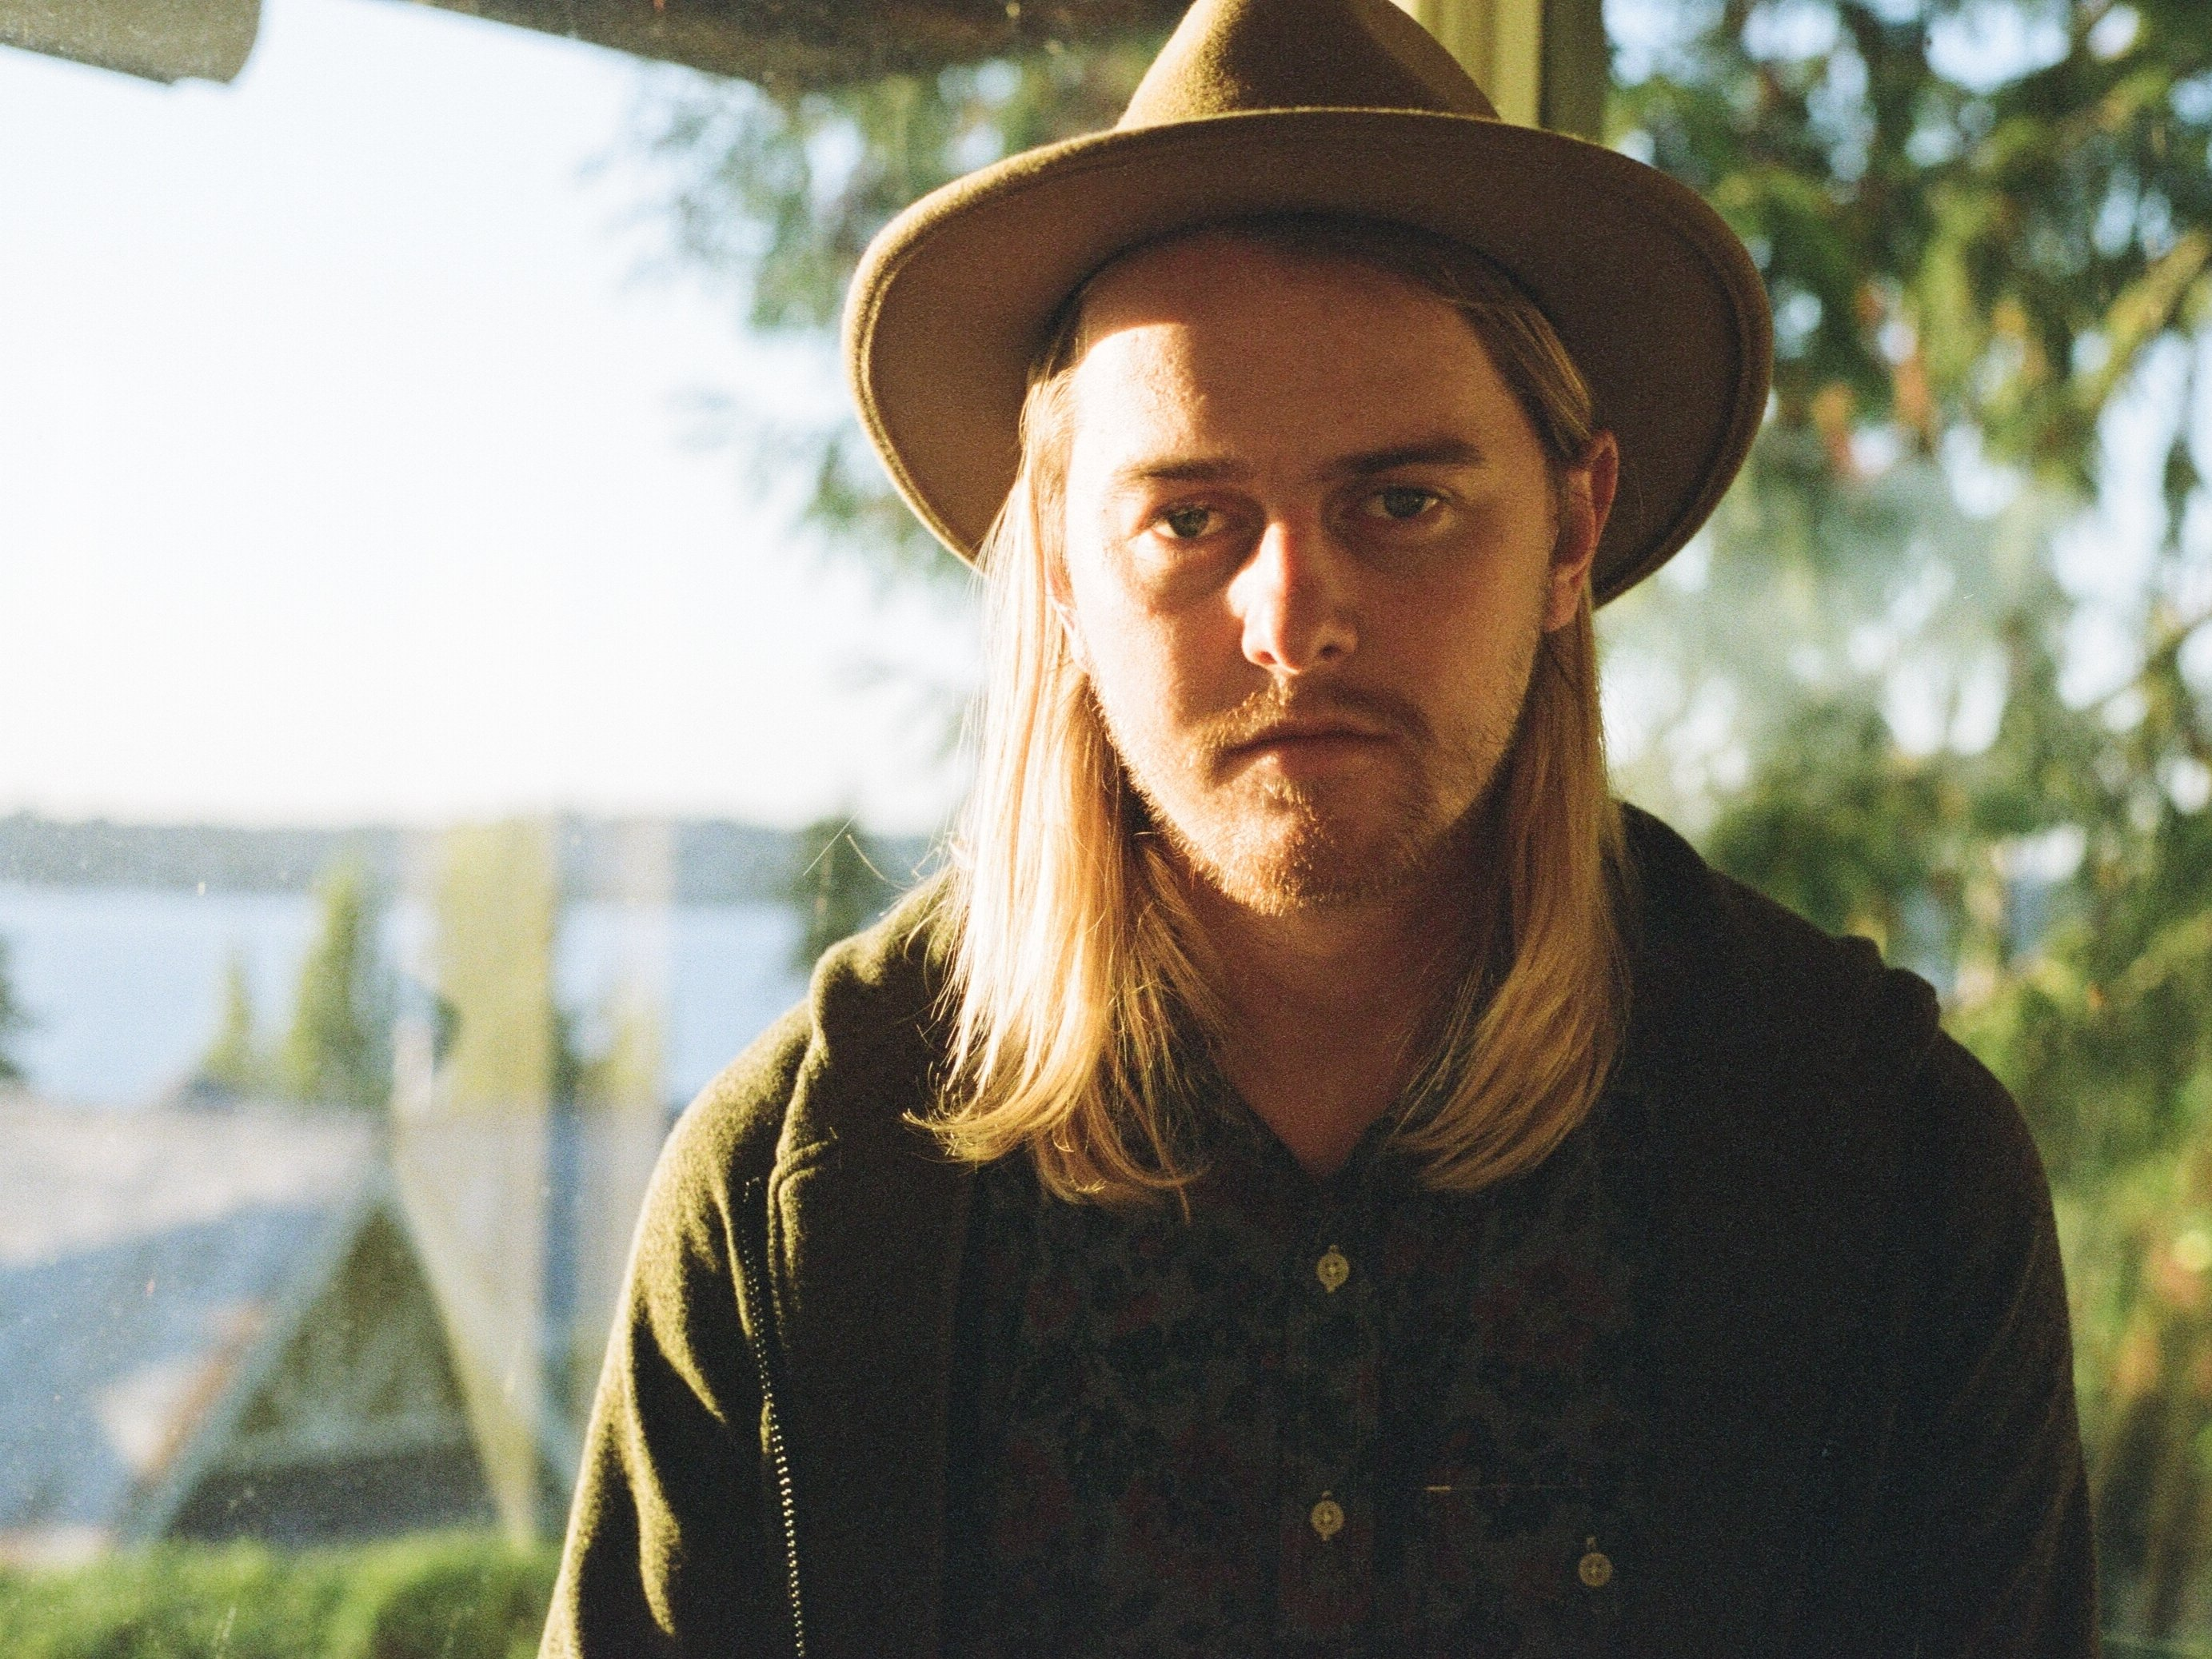 Image for Jake Tittle